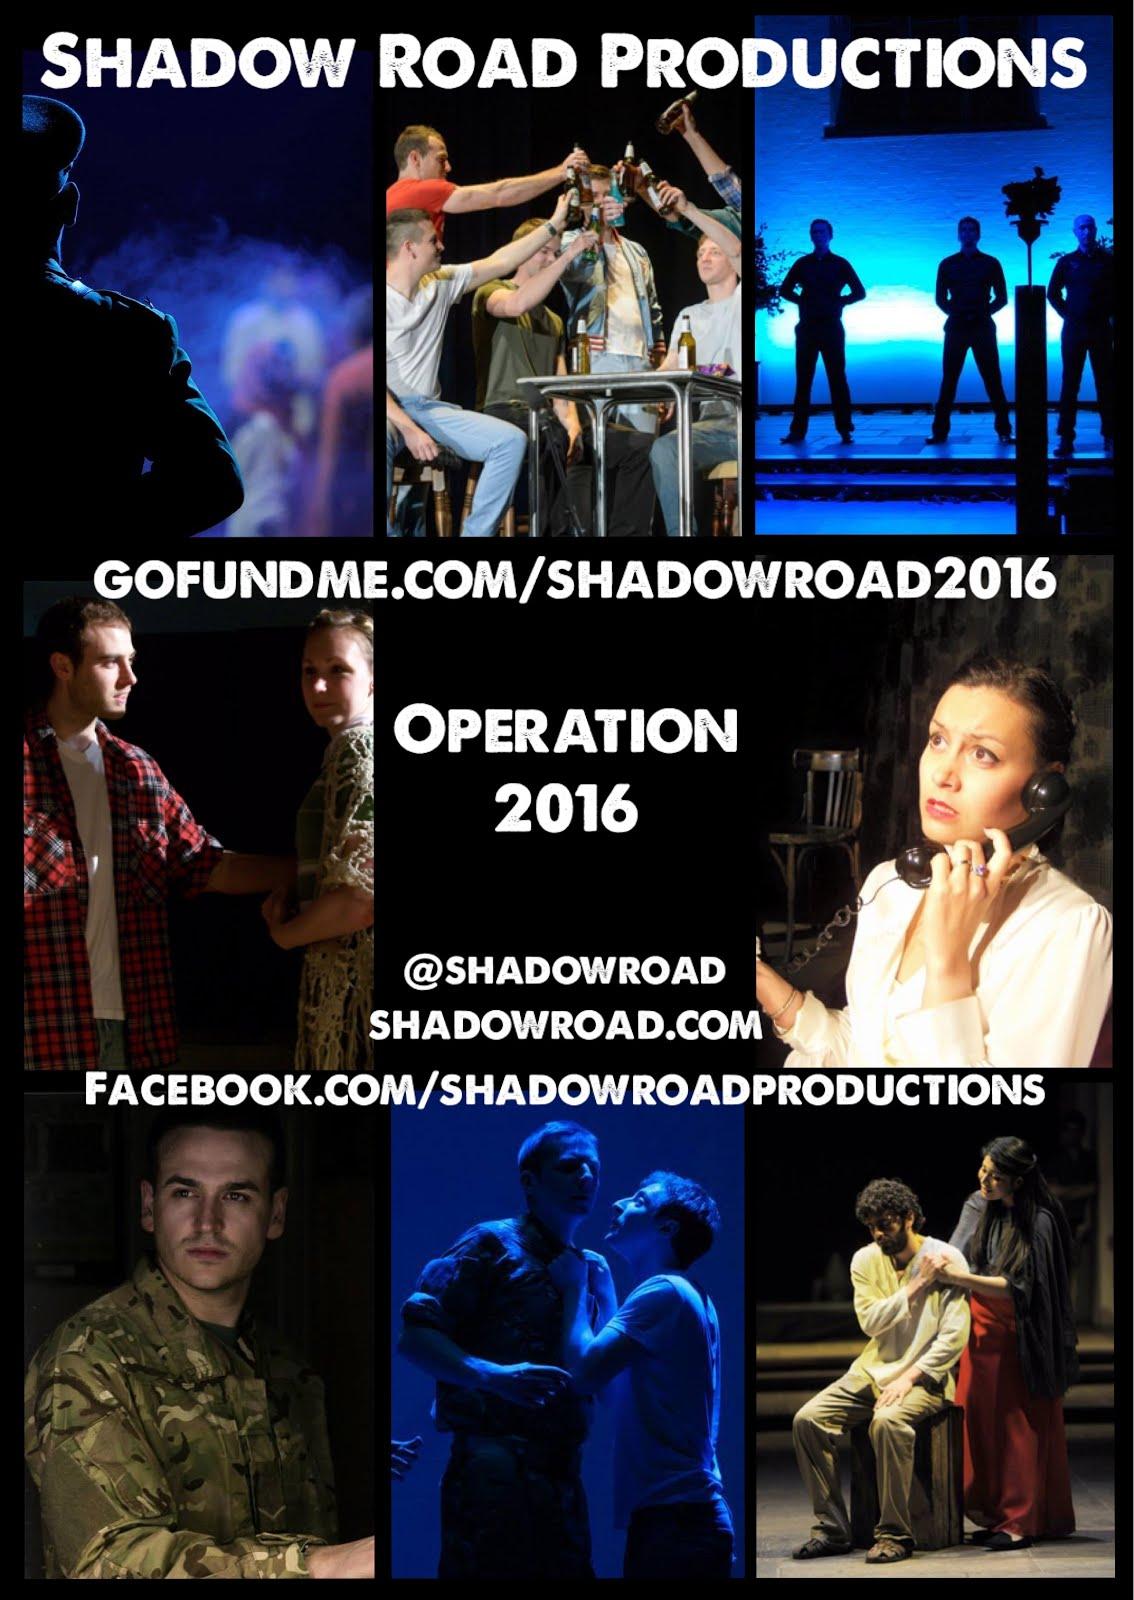 Operation 2016